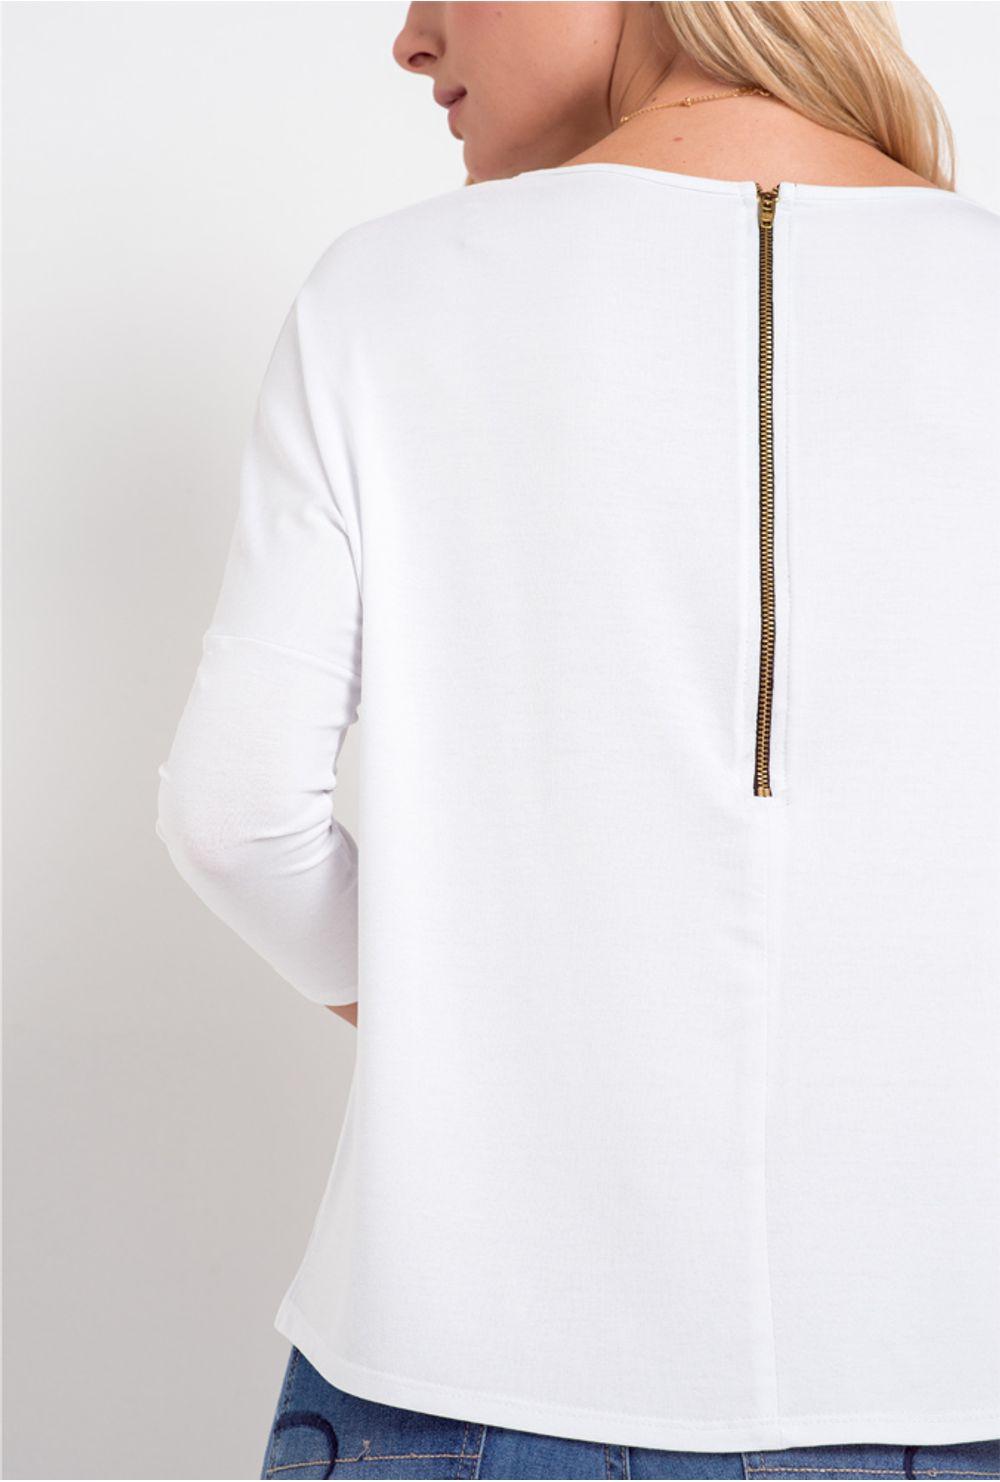 4f4631256 Blusa Básica Feminina Hungria Branca - Moda Premium - Mobile